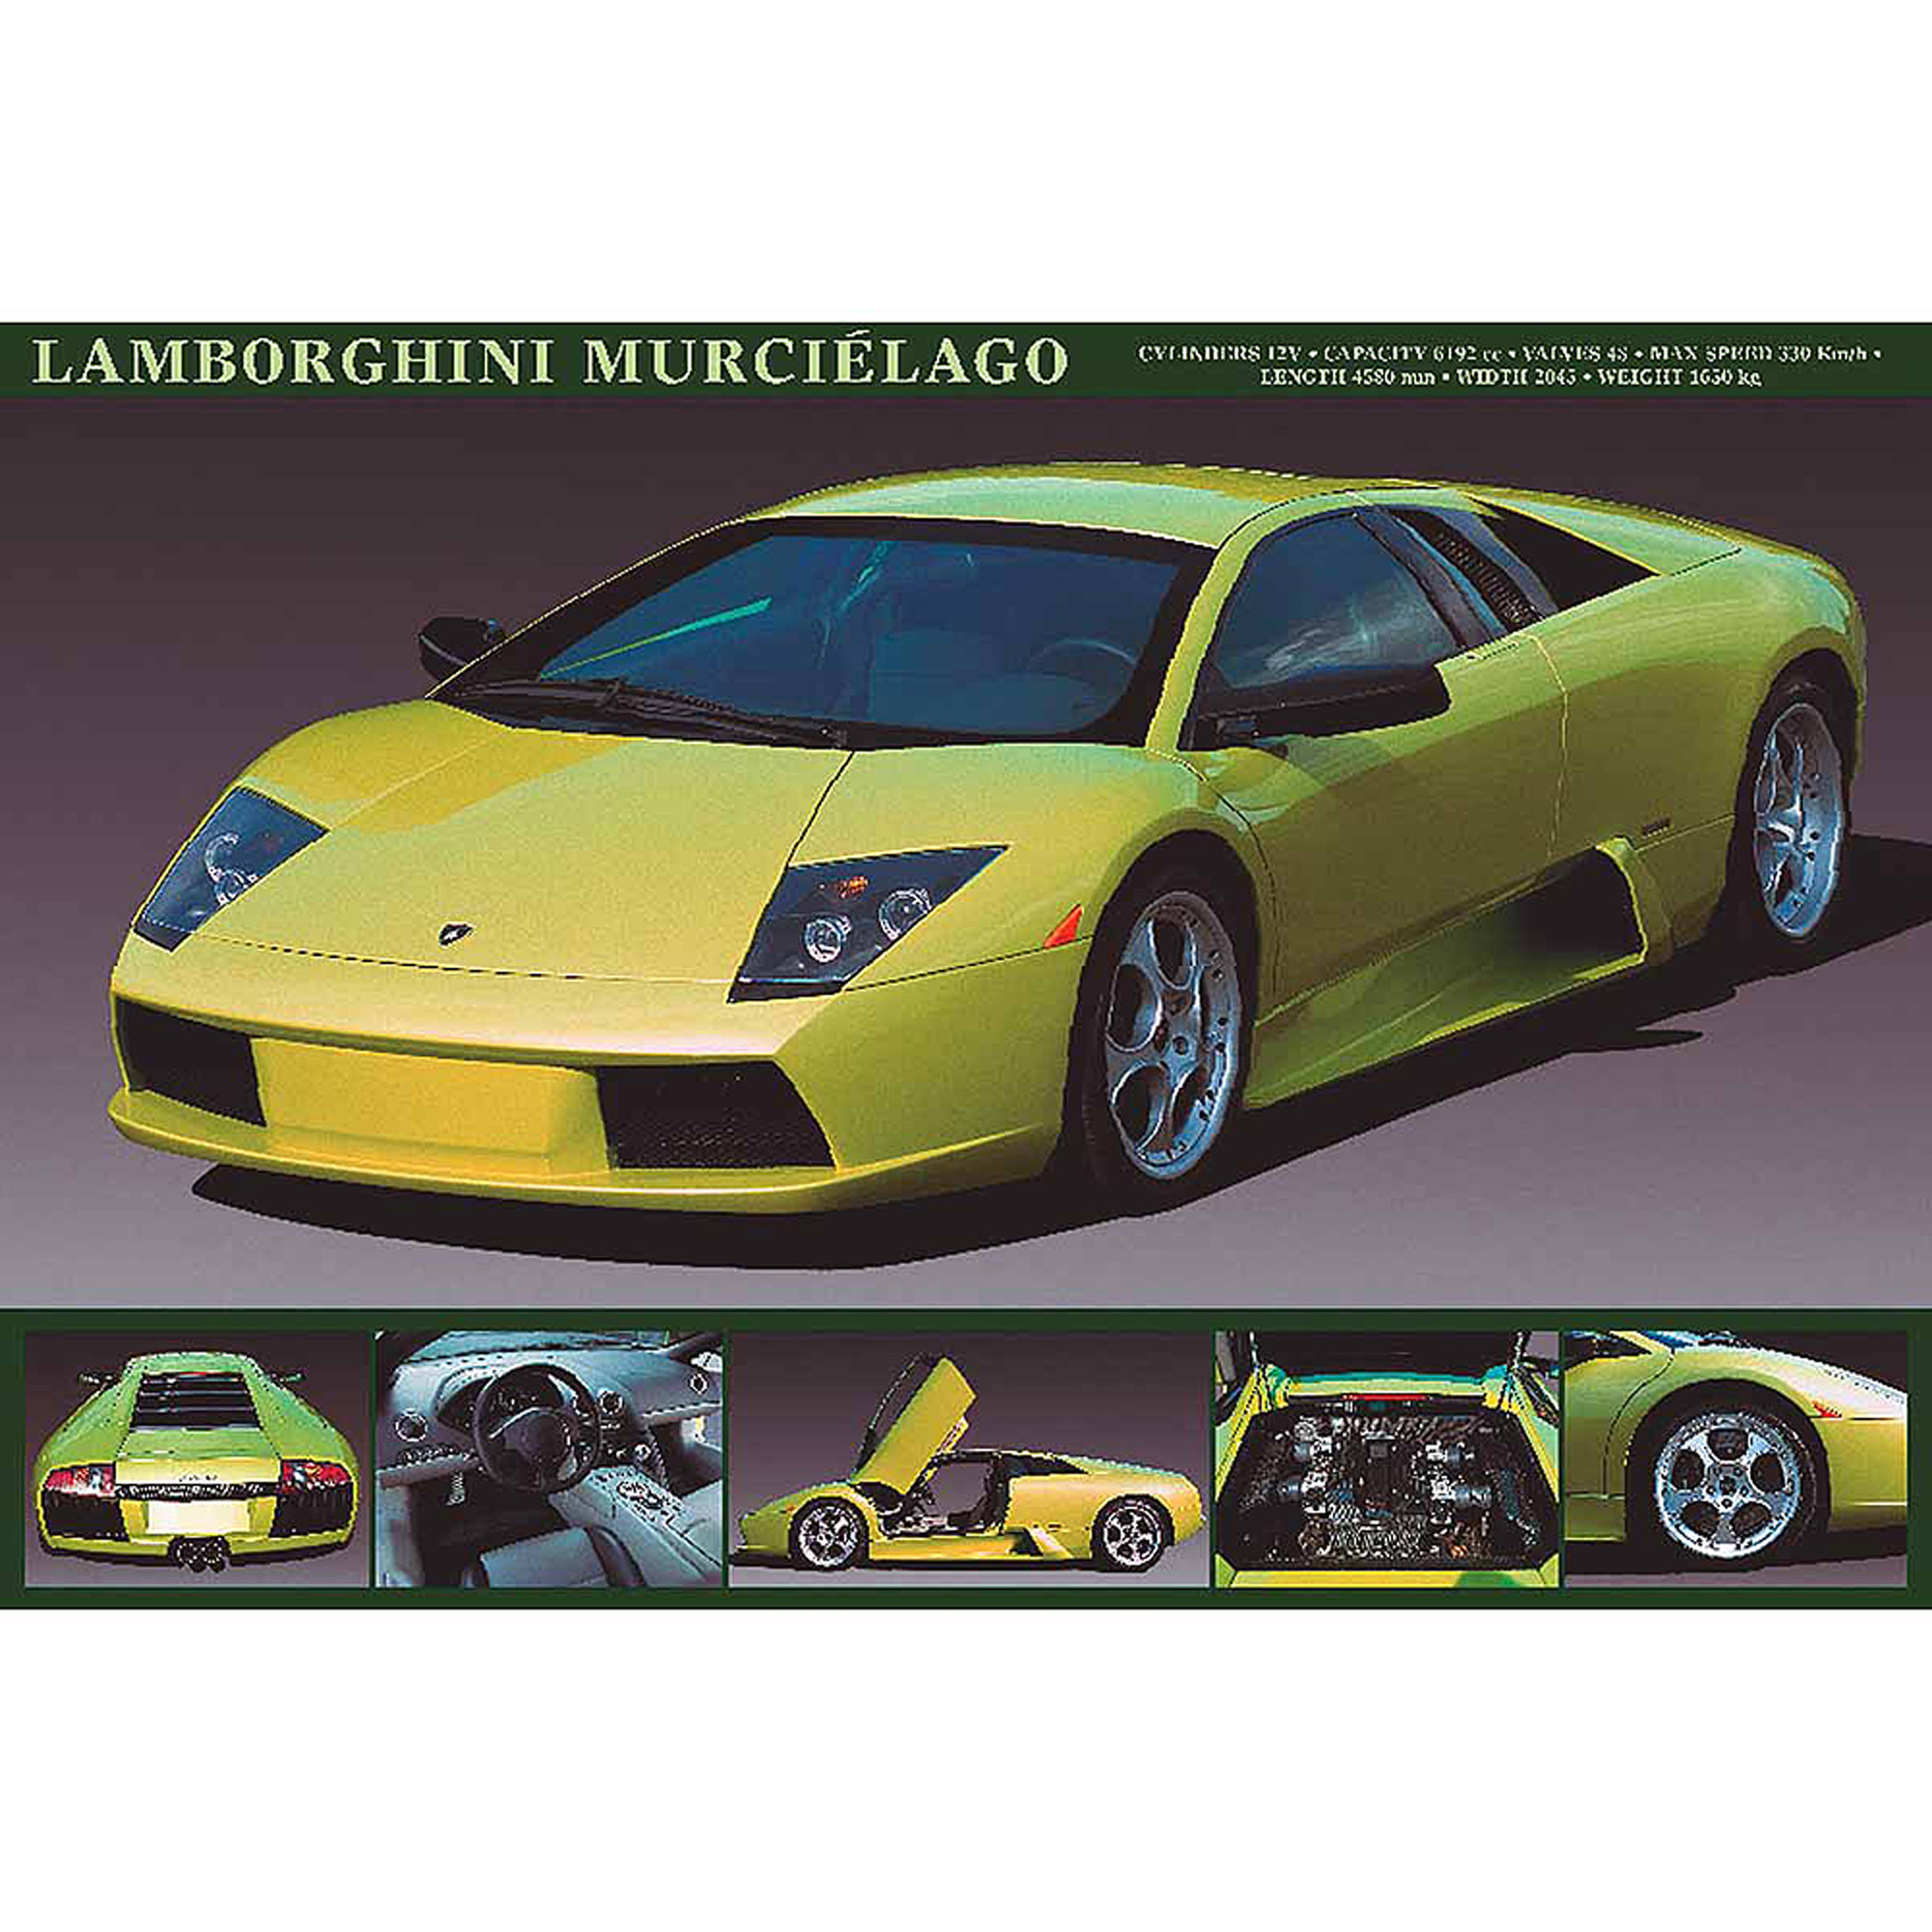 Lamborghini Murcielago Photography Art